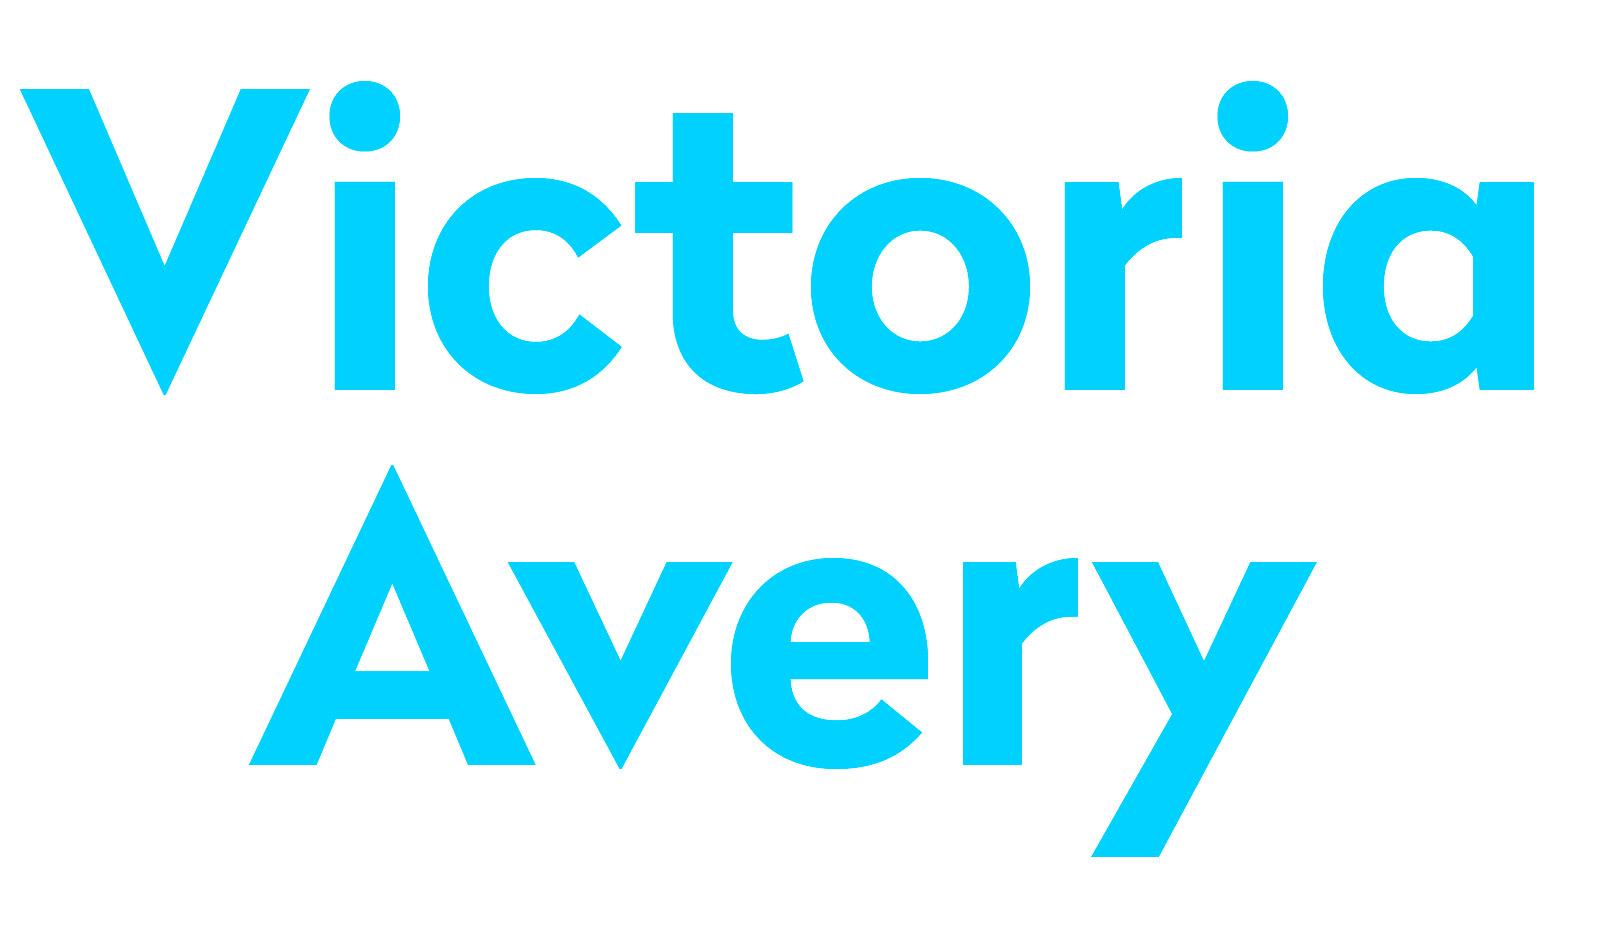 Victoria Avery